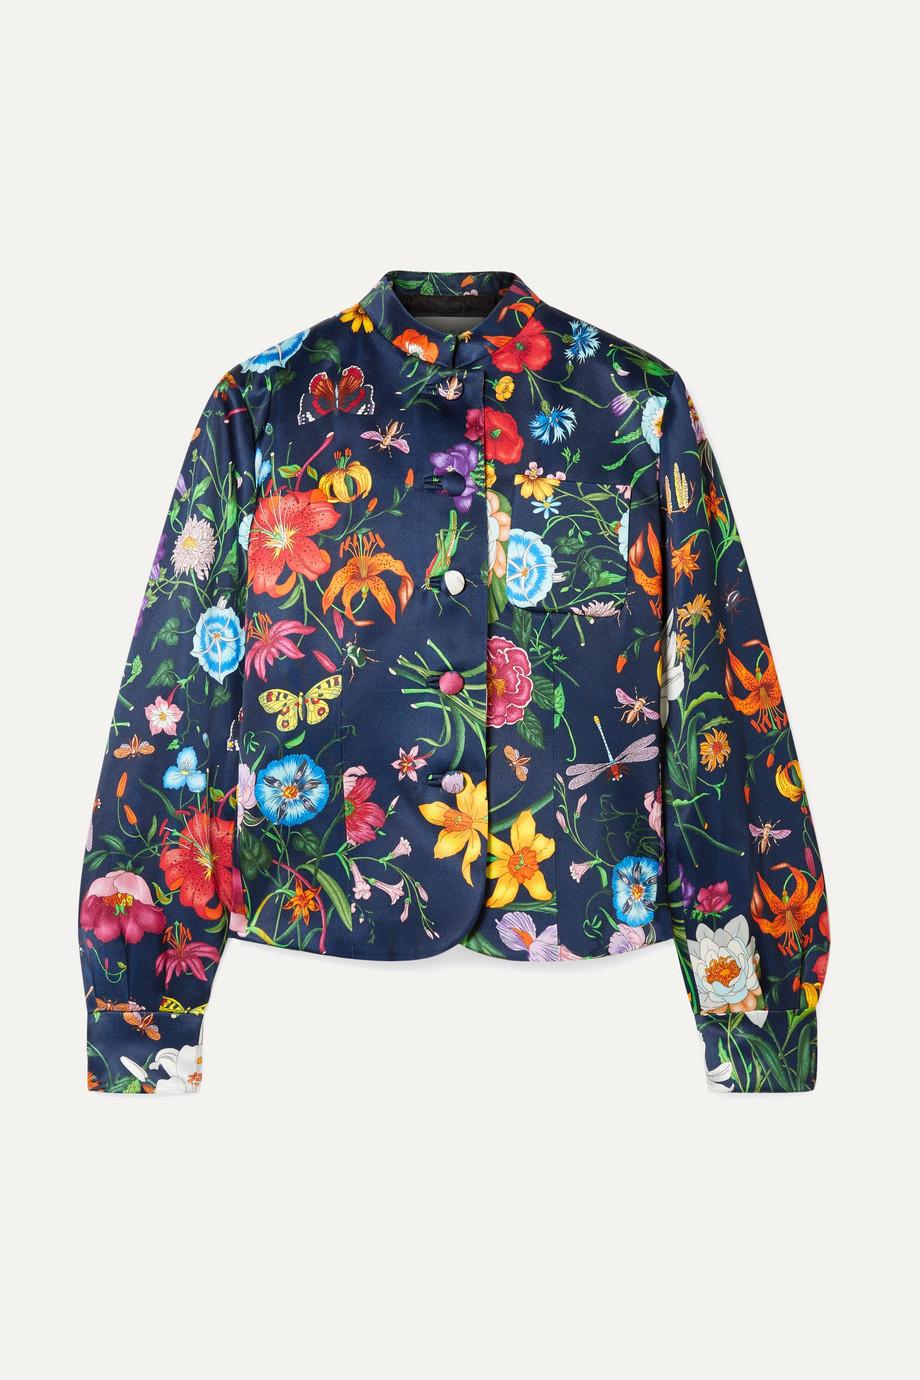 Gucci Floral-print silk-satin jacket